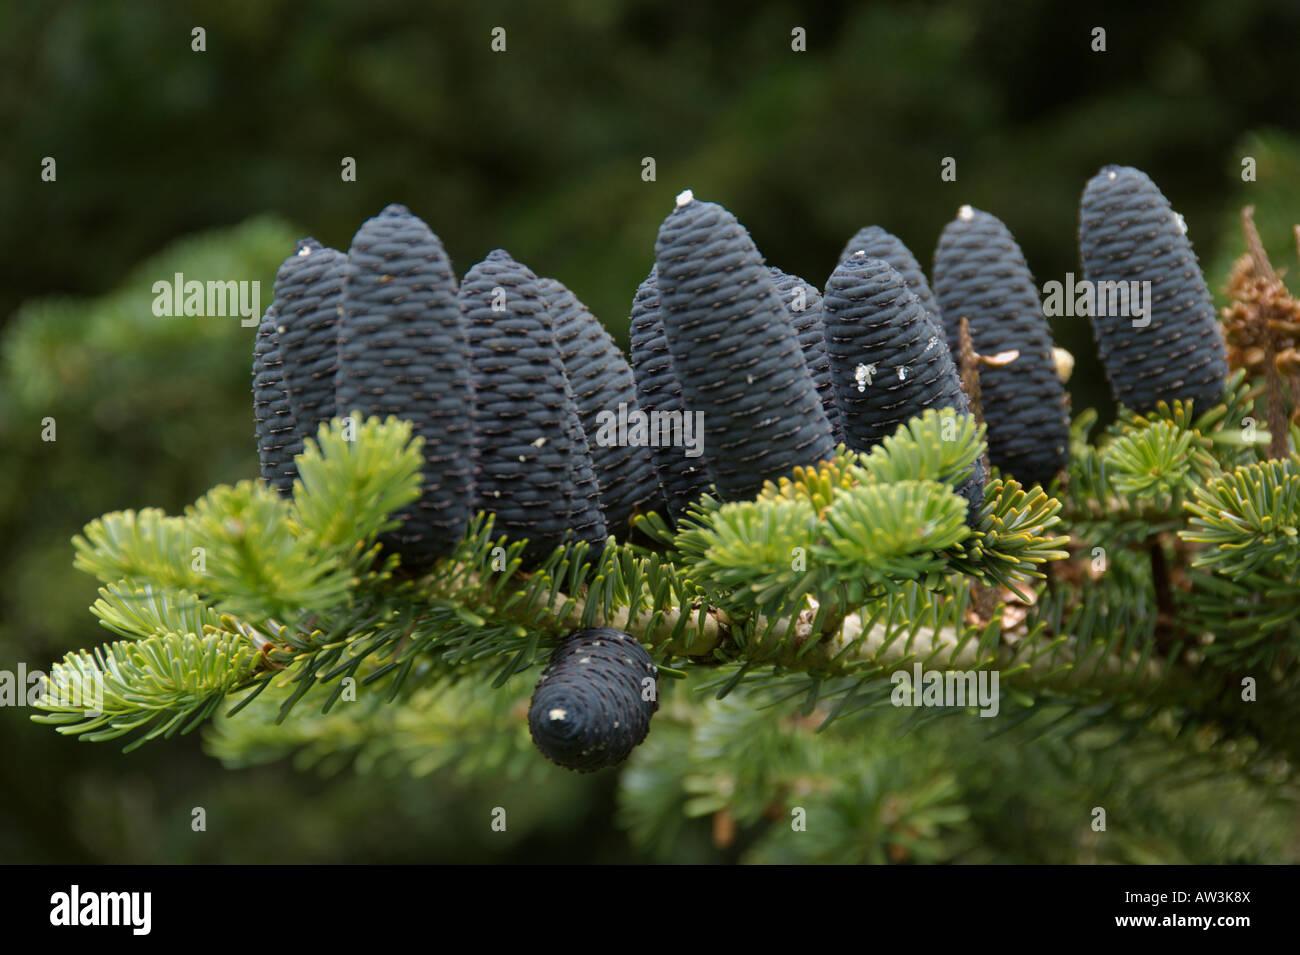 Scots Pine cones  Aberdeenshire Highlands Scotland August 2007 - Stock Image